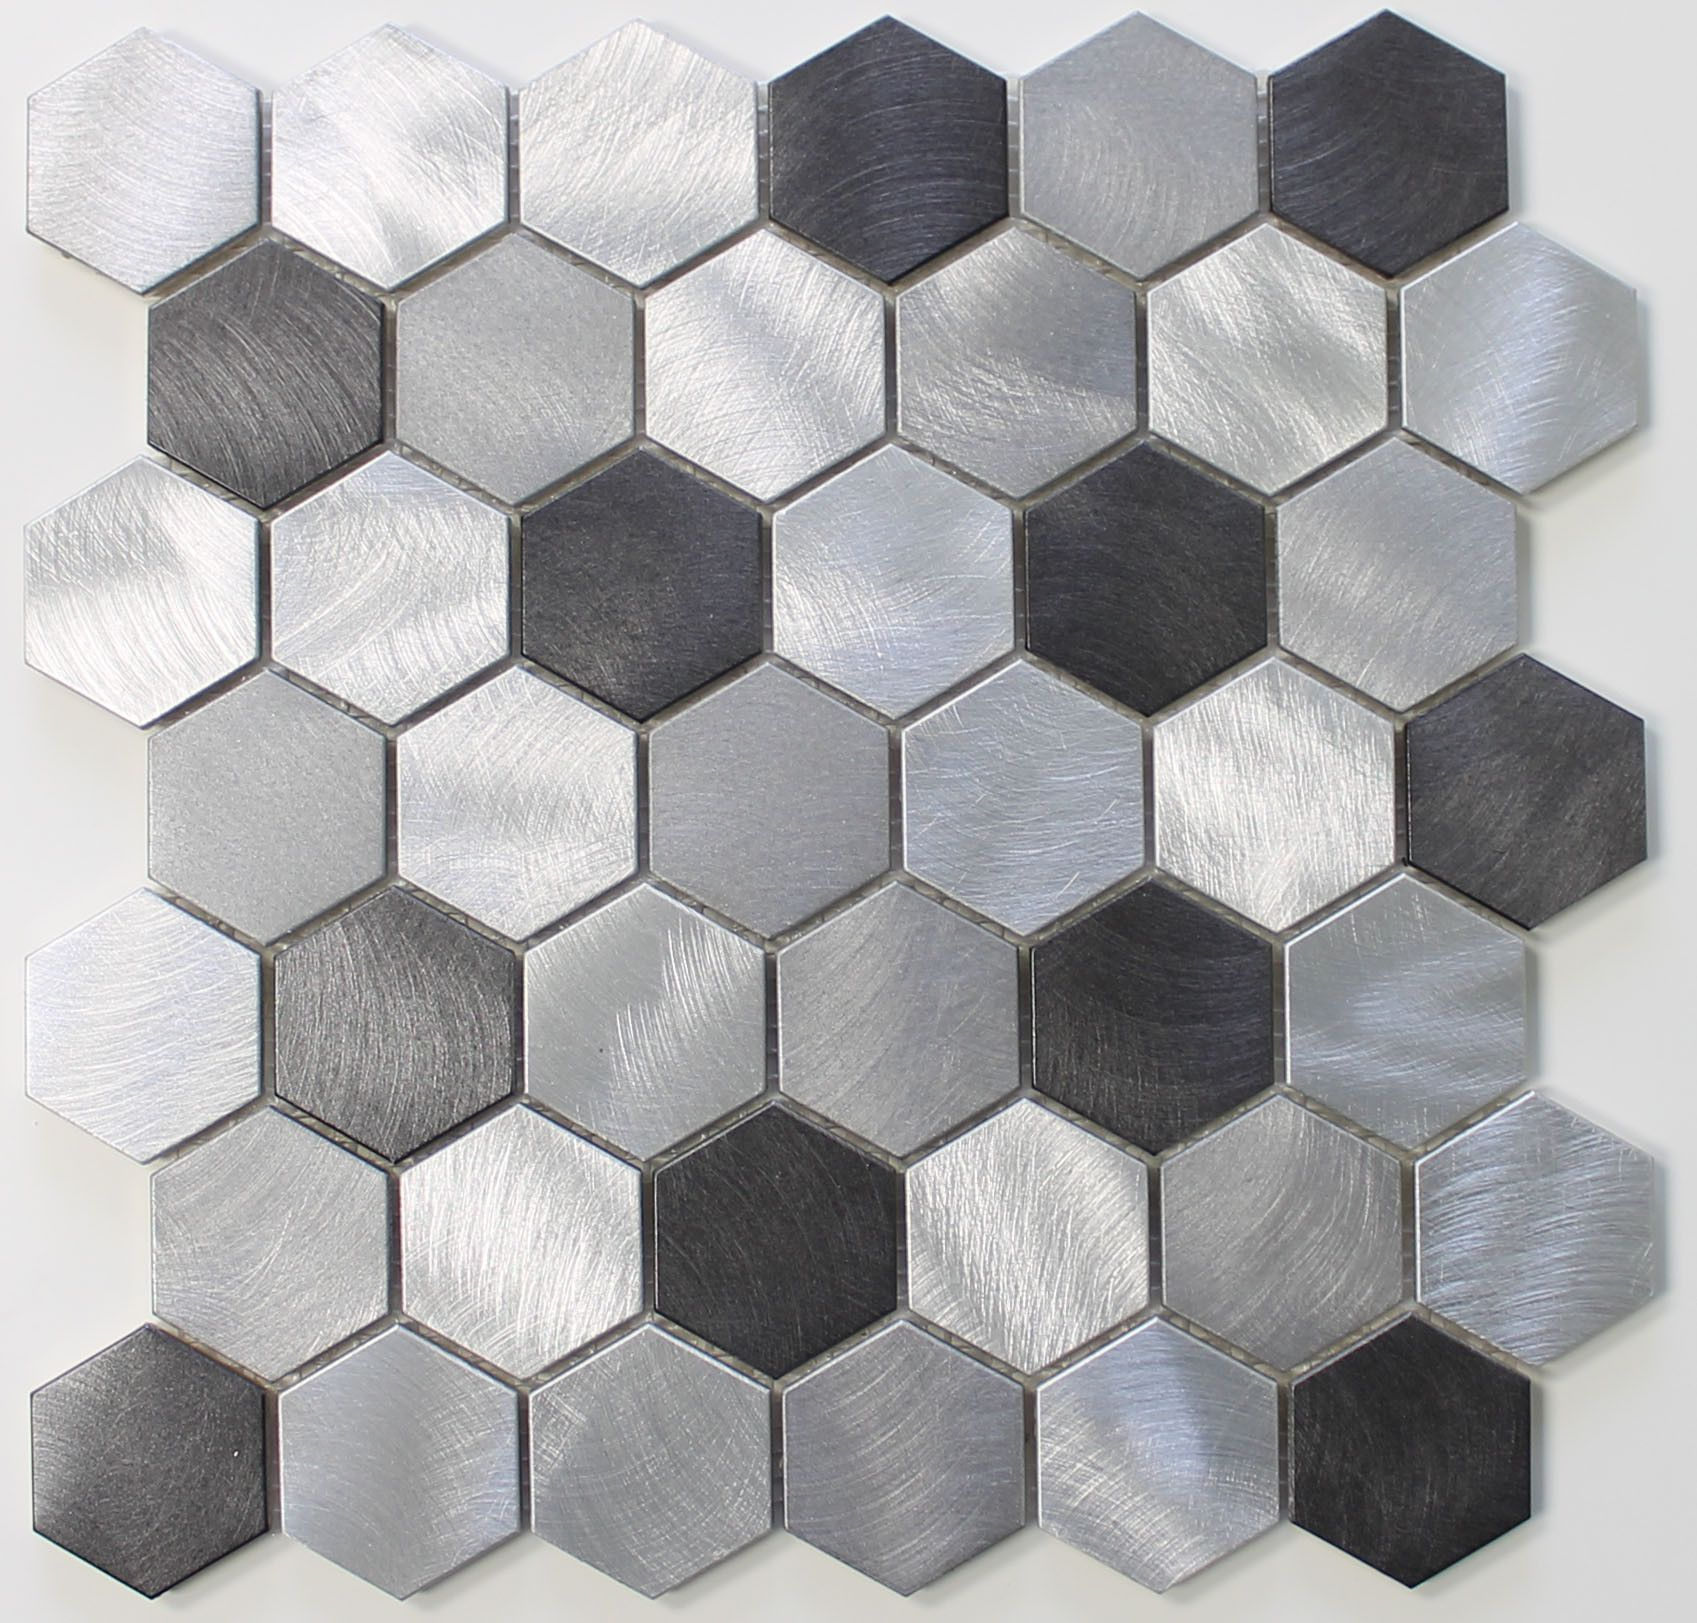 Uptown brushed aluminum 2 inch hexagon mosaic tiles hexagon uptown brushed aluminum 2 inch hexagon mosaic tiles dailygadgetfo Gallery